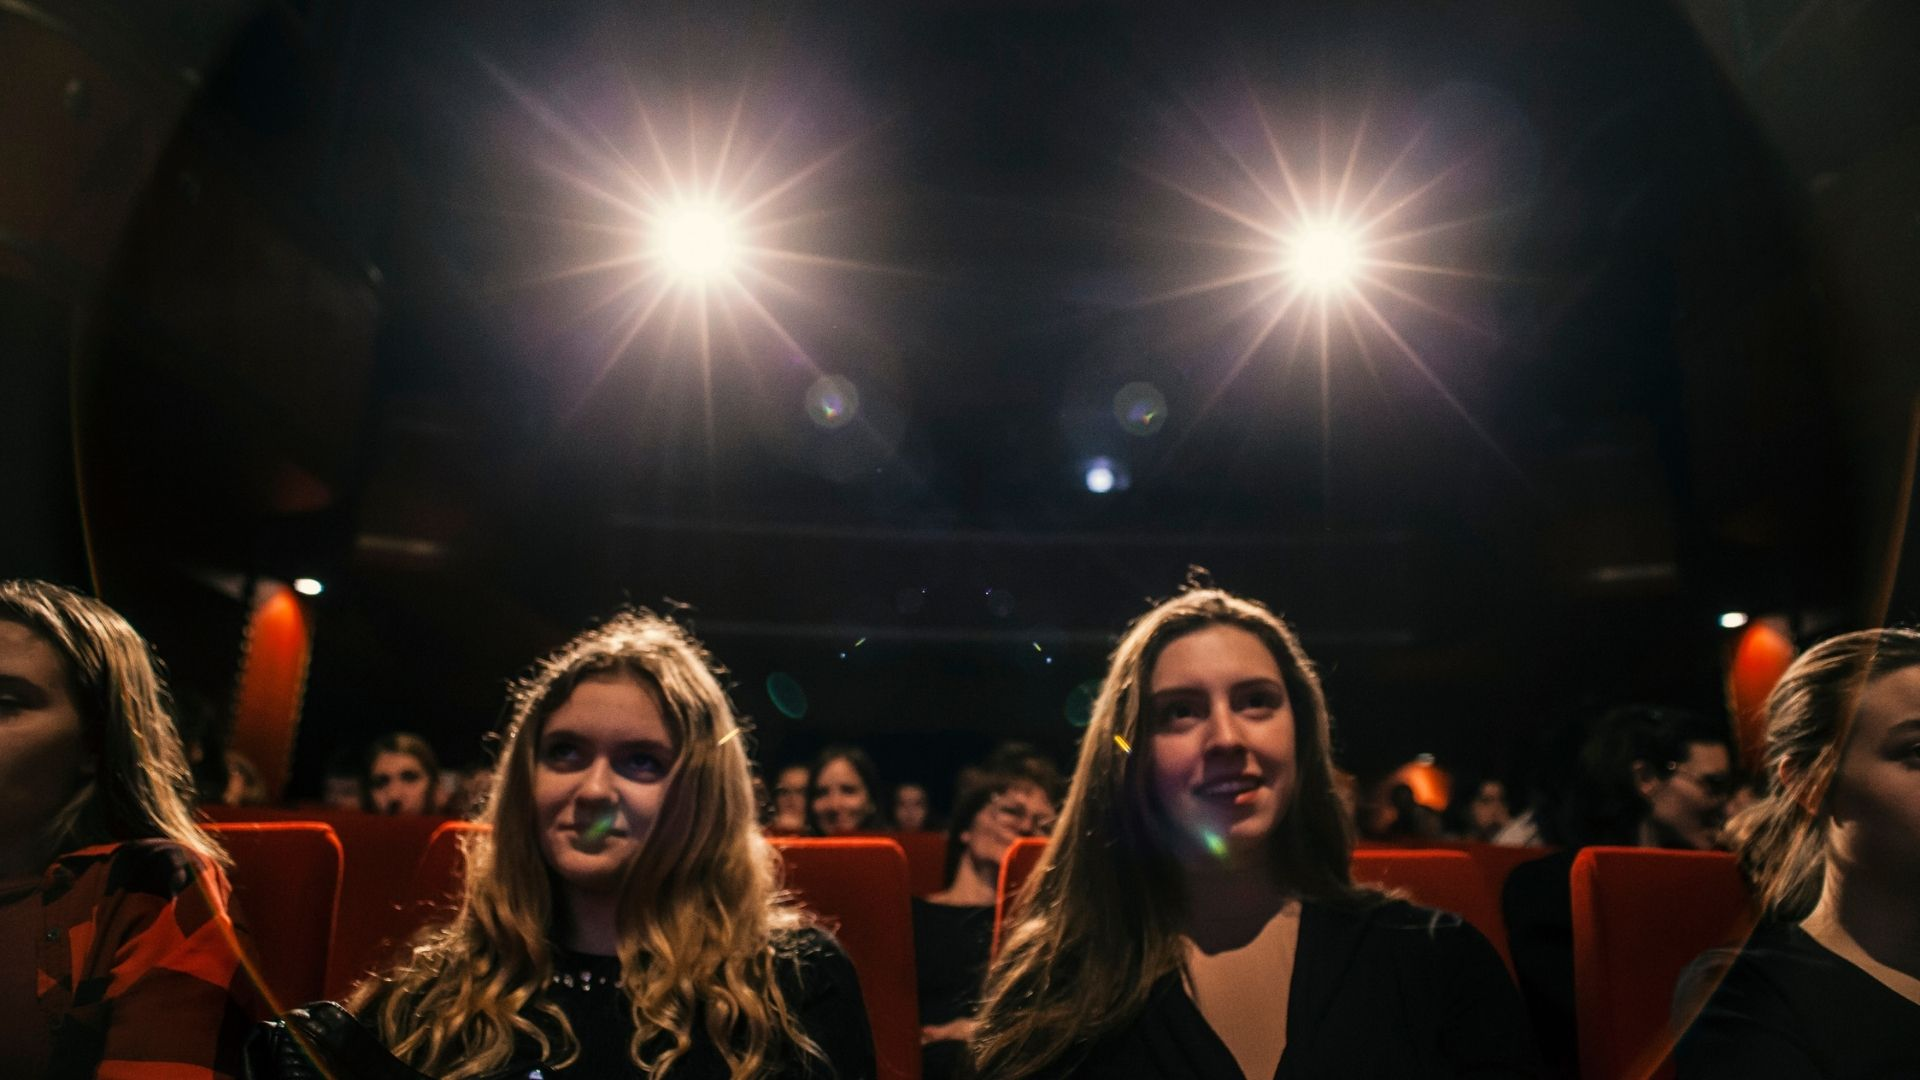 Tickets for the 5th Kinotrip International Film Festival